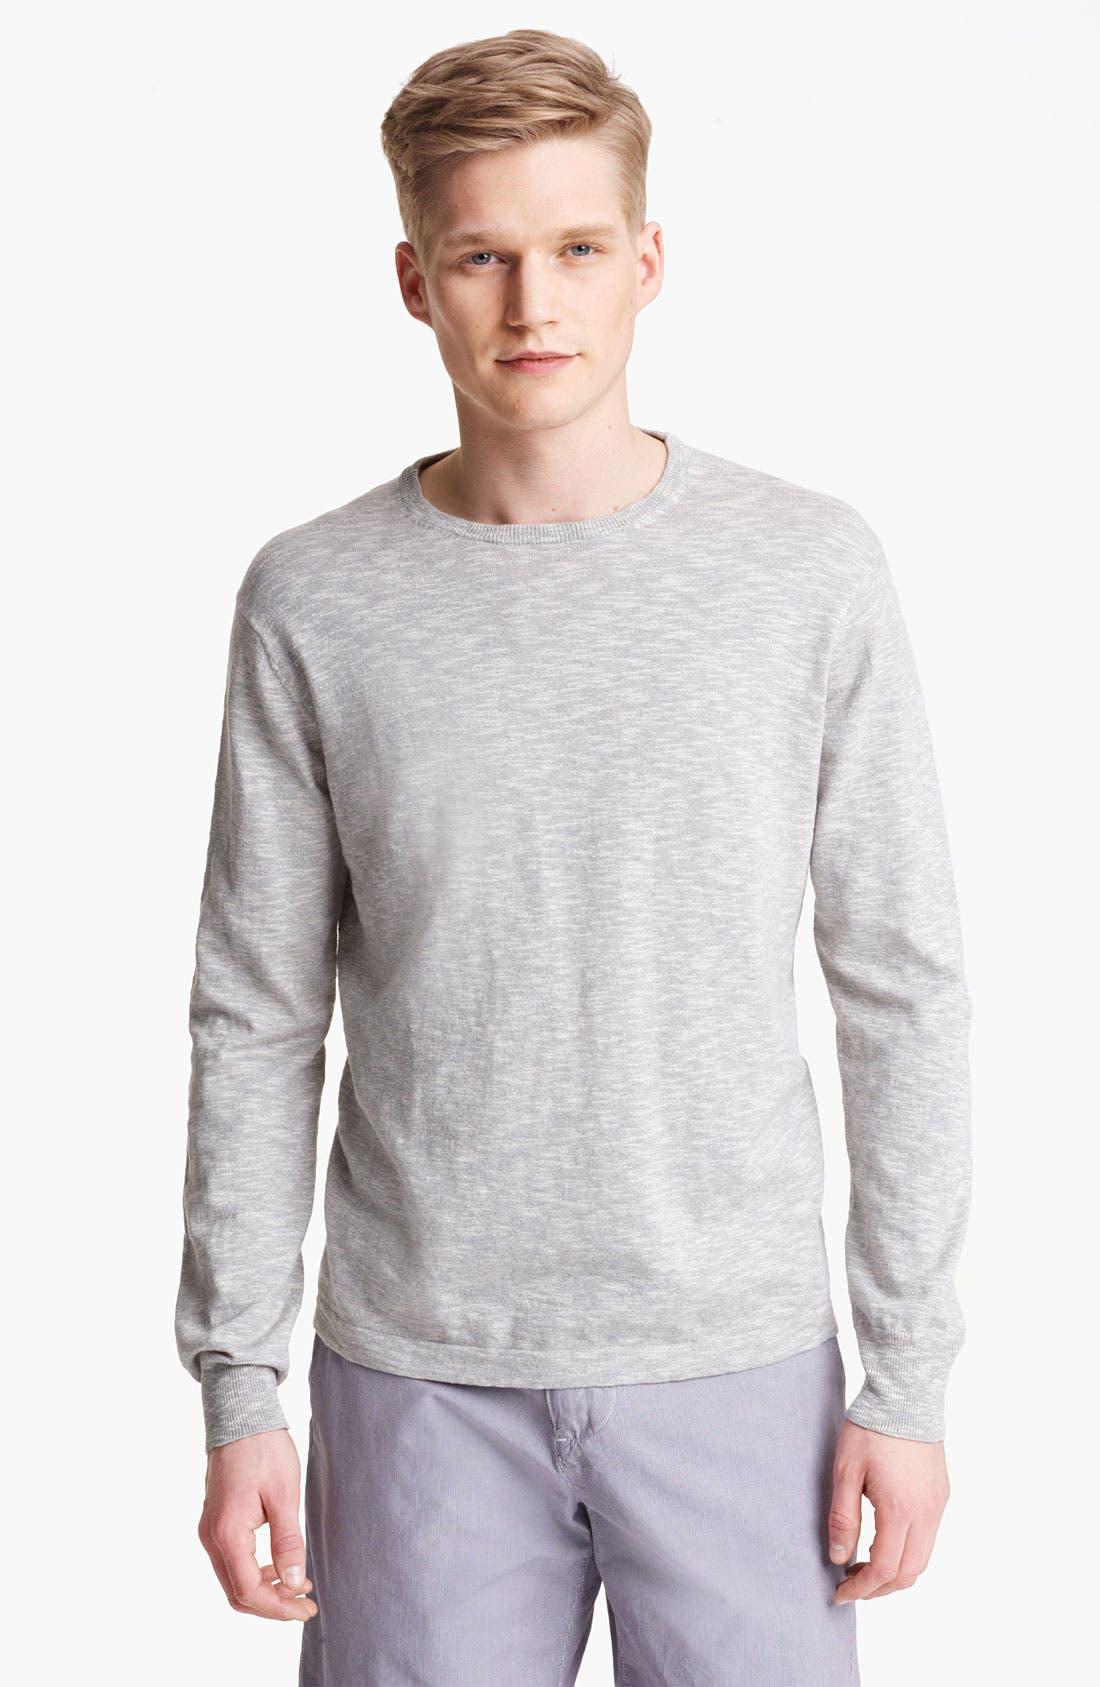 Alternate Image 1 Selected - Save Khaki Slub Knit Sweater